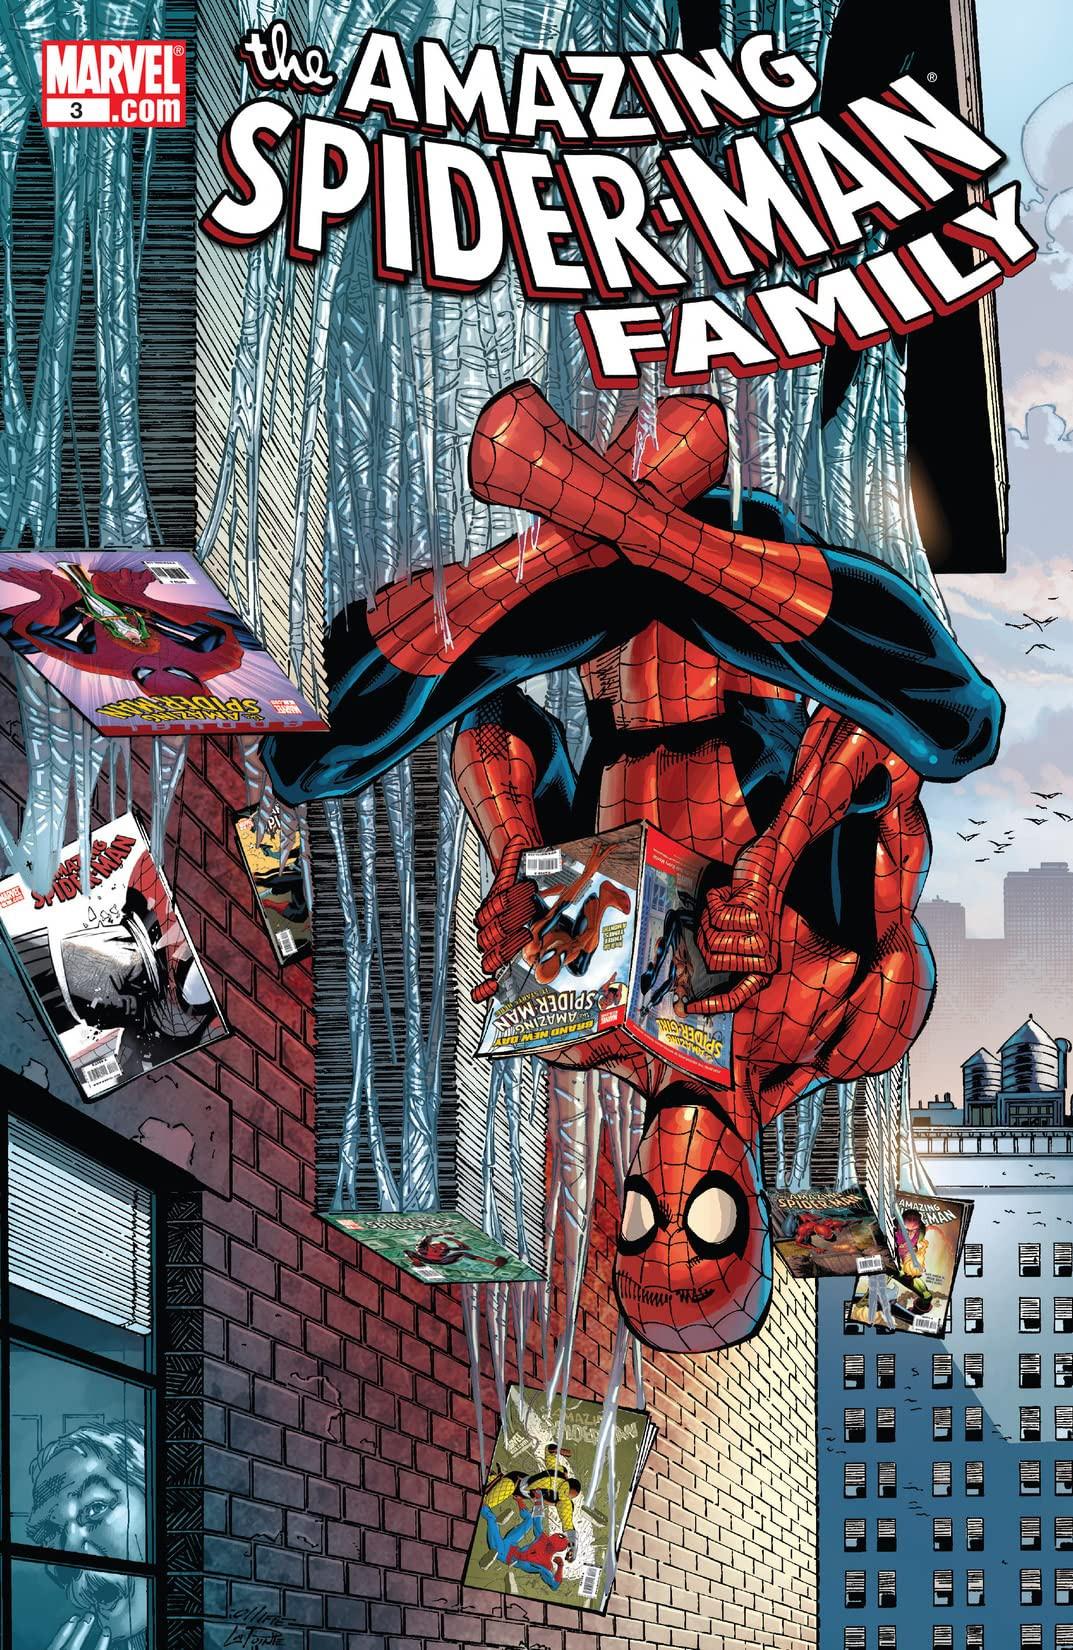 Amazing Spider-Man Family Vol 1 3